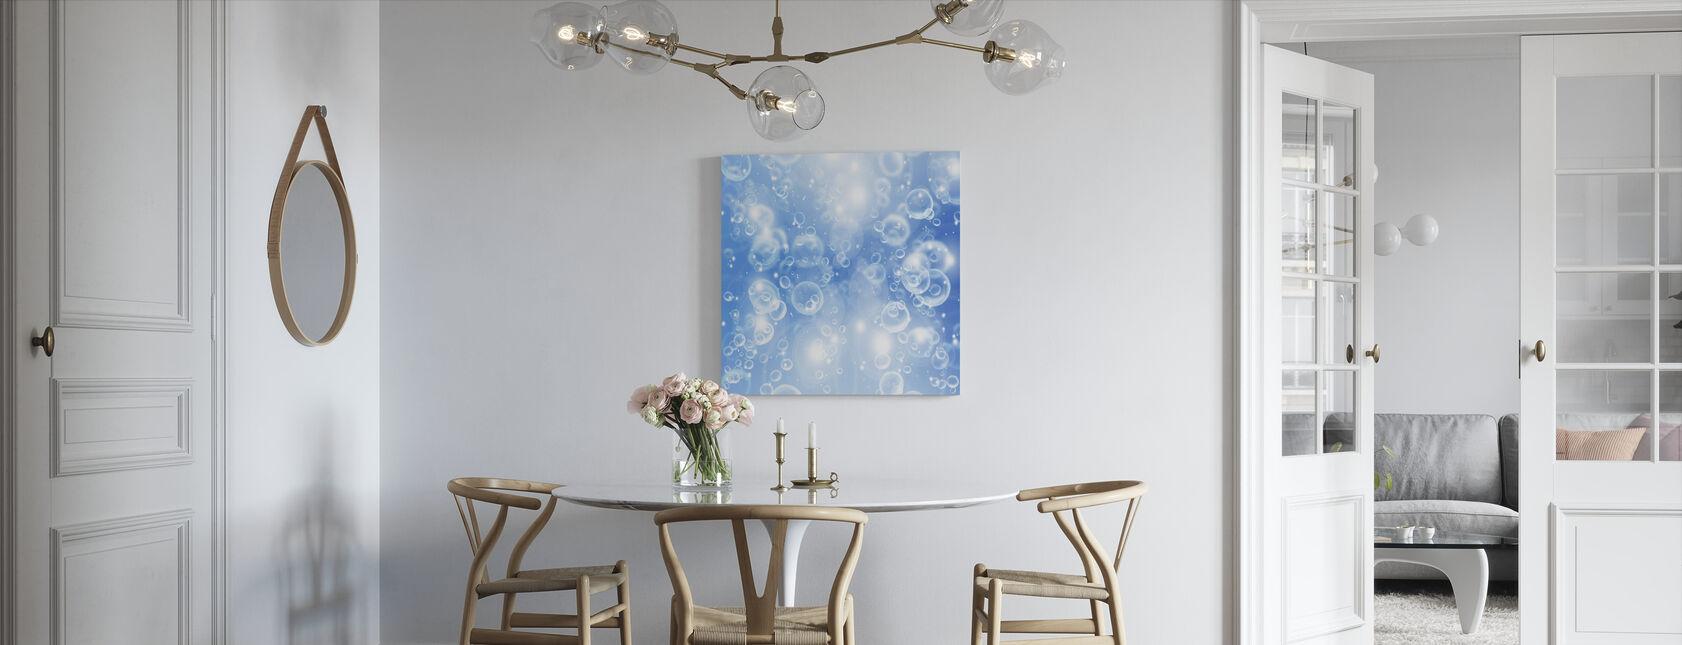 Rising air Bubbles - Canvas print - Kitchen